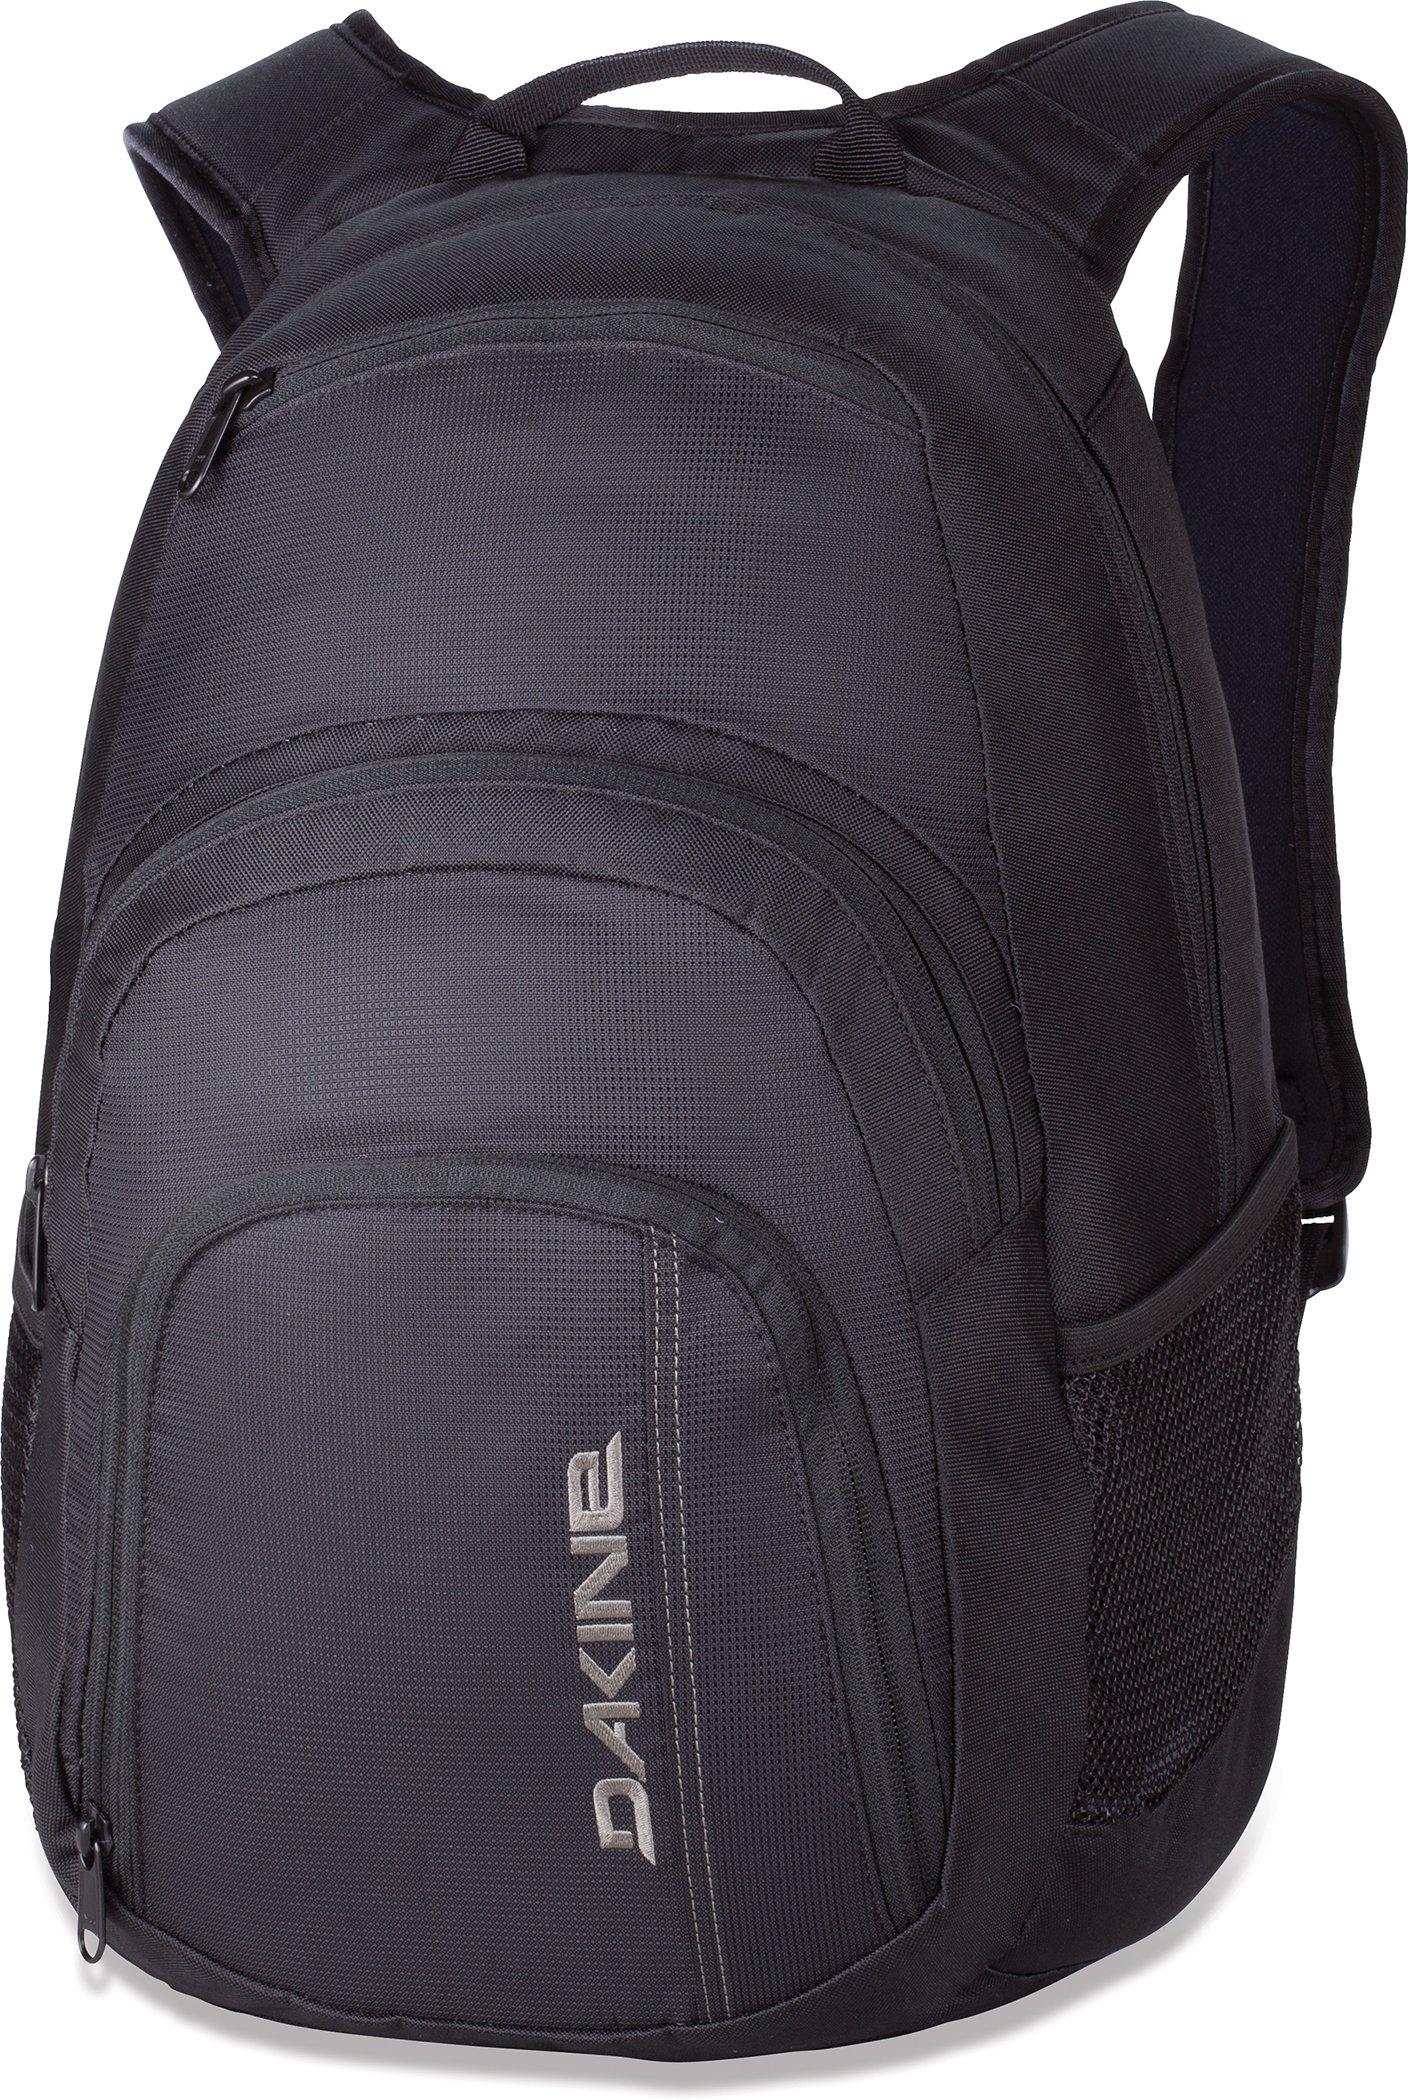 Dakine Campus 25L Lifestyle Backpack, One Size, Black